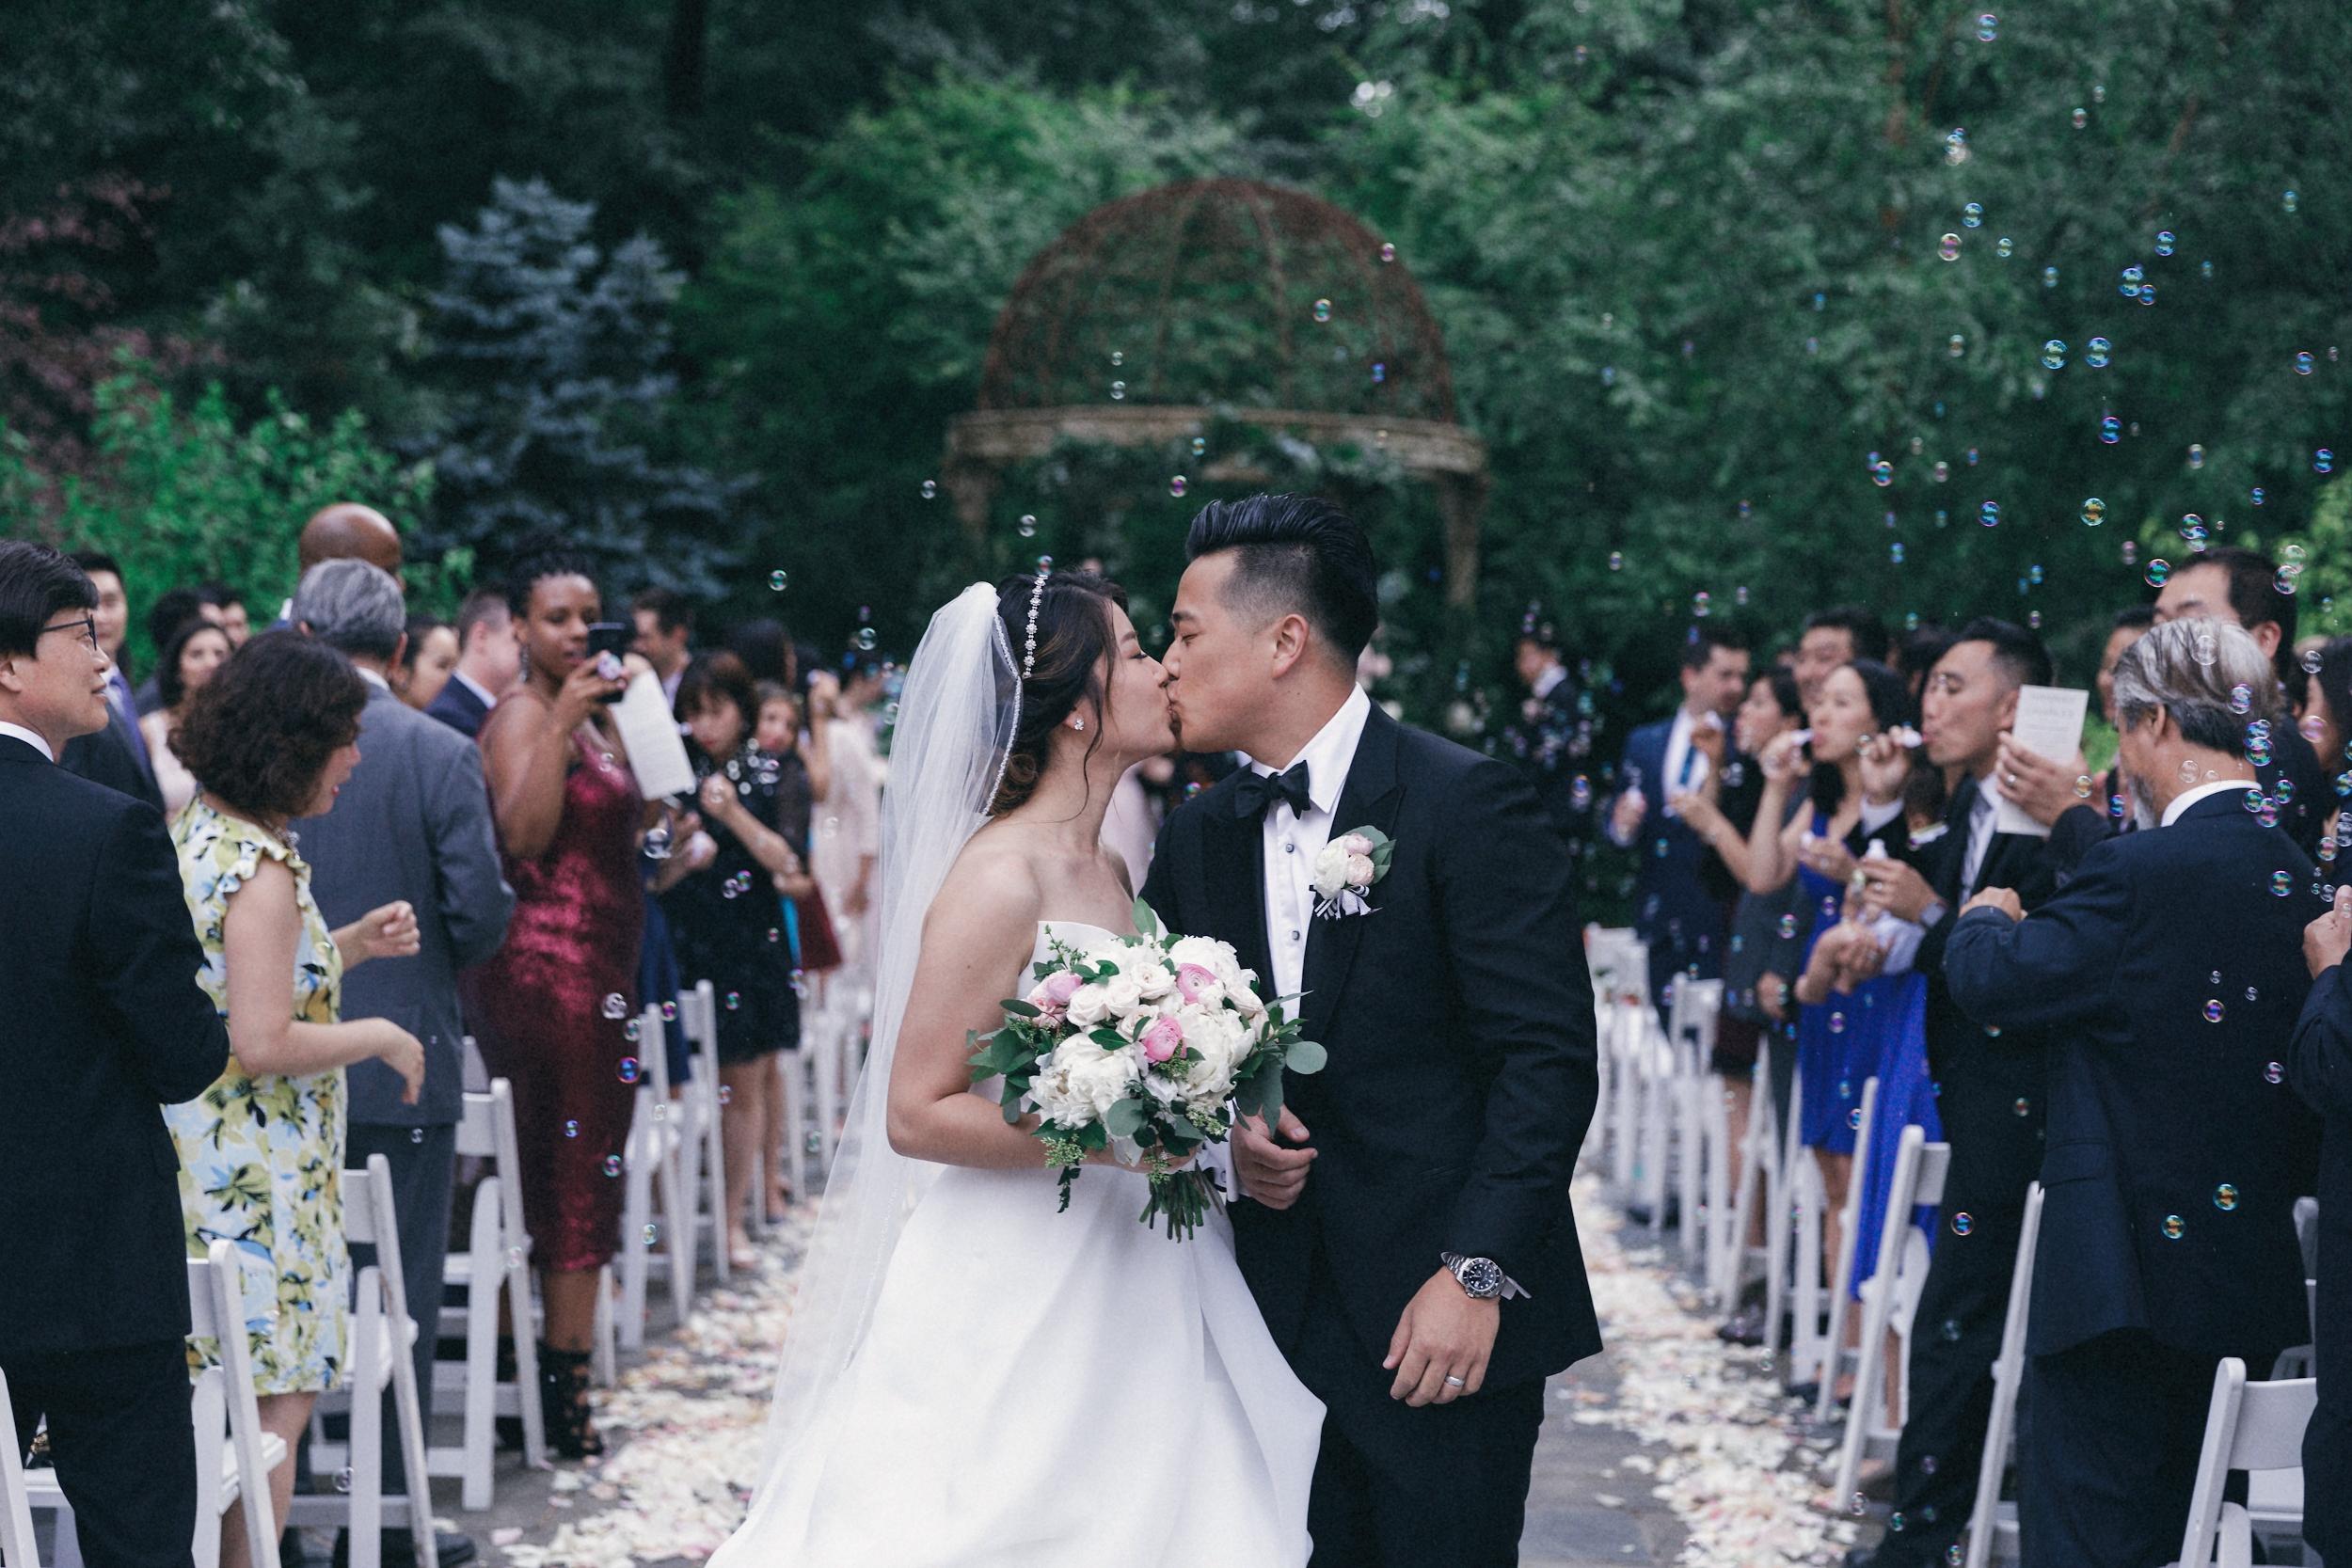 HANNAH-CHARLES-WEDDING-2024.jpg